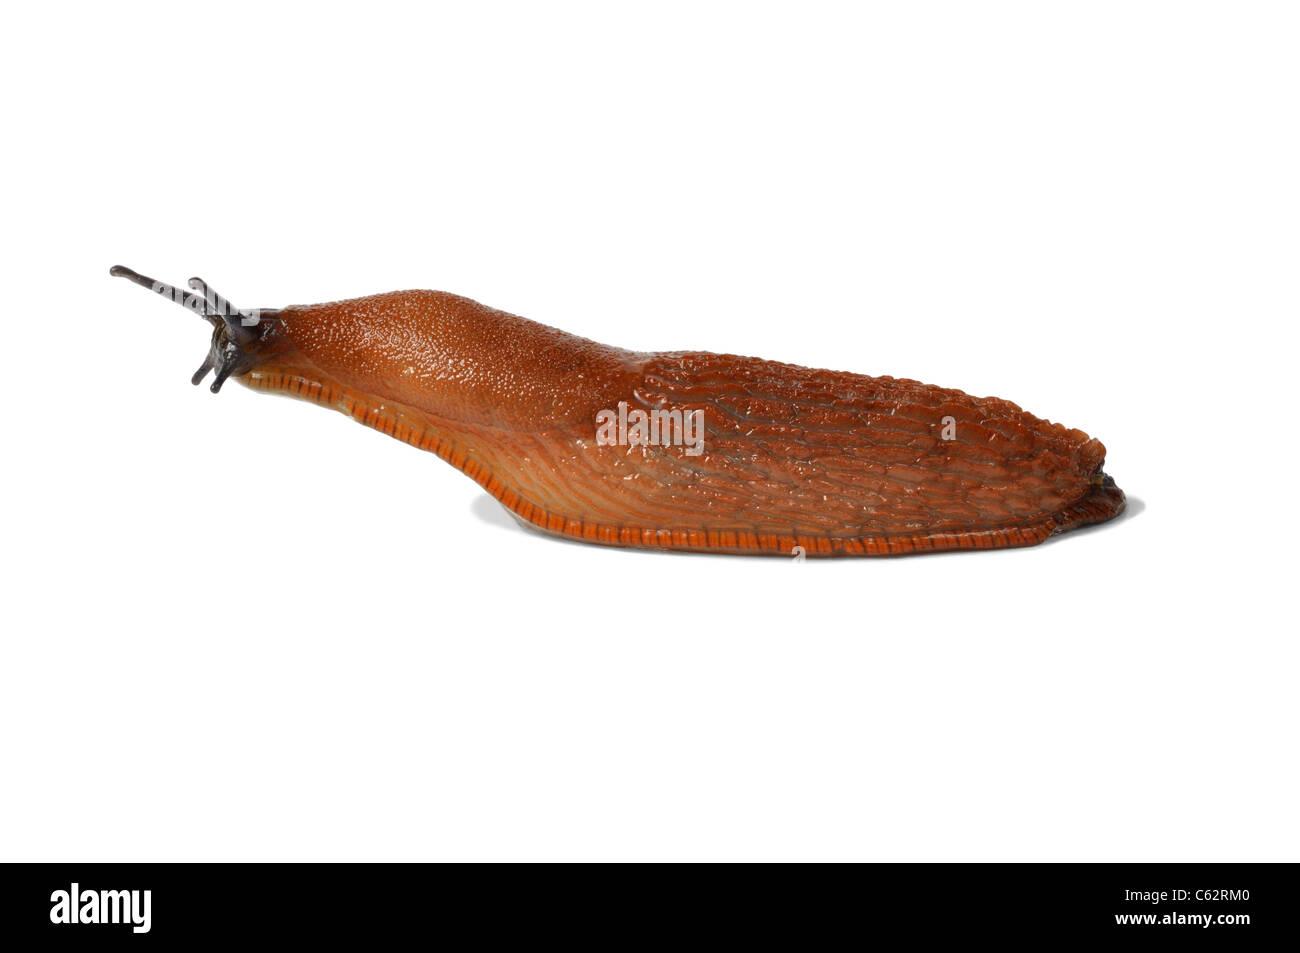 Spanish Slug - Stock Image